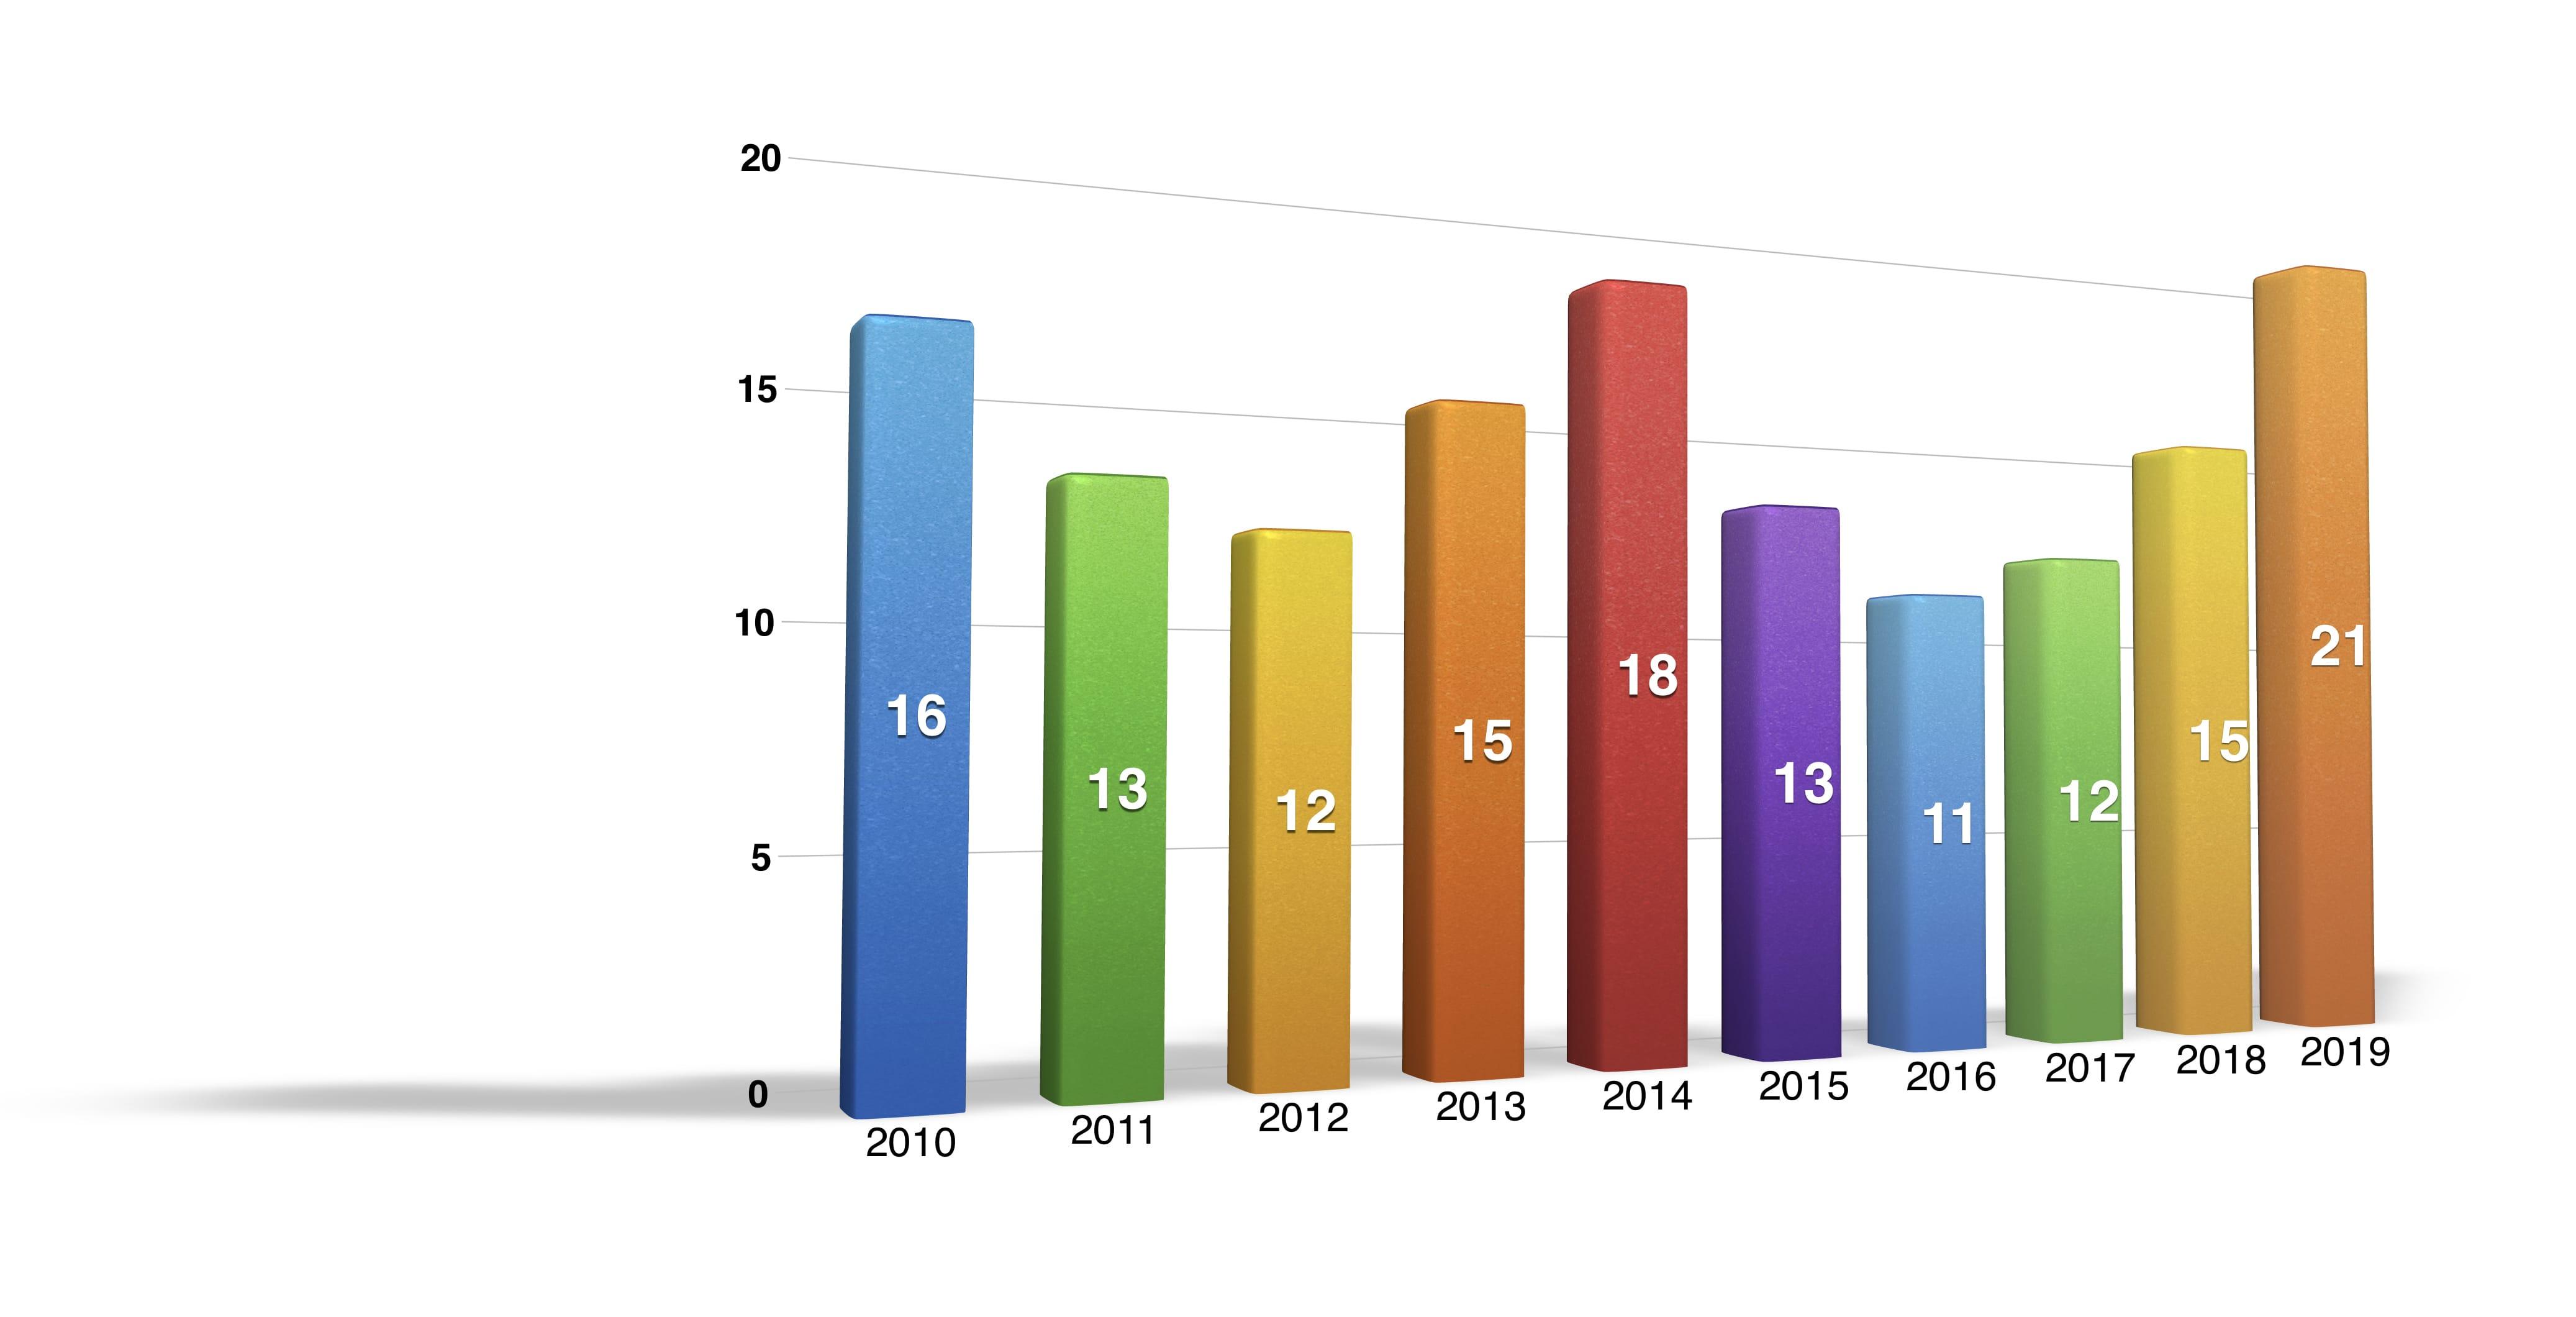 Turnover 2010-2019